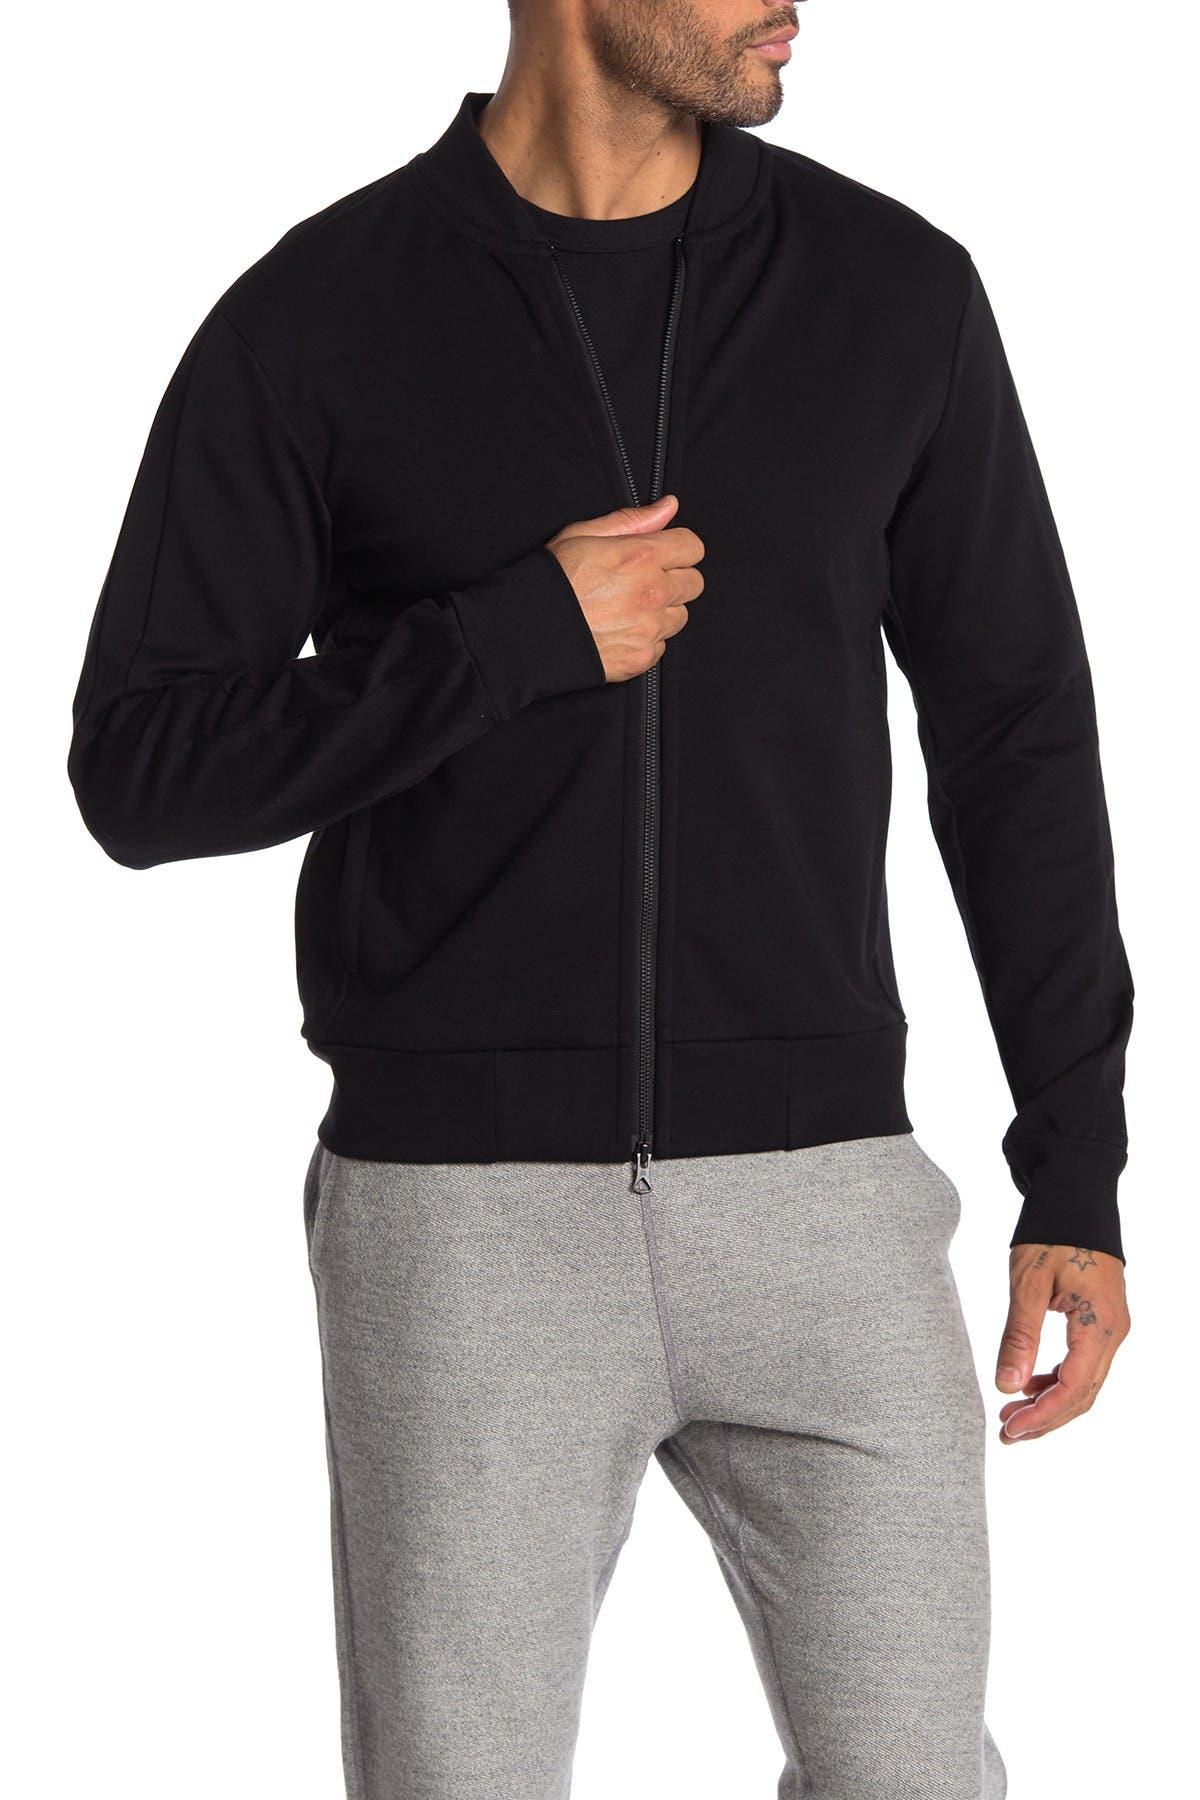 Image of REIGNING CHAMP Ponte Warm Up Jacket